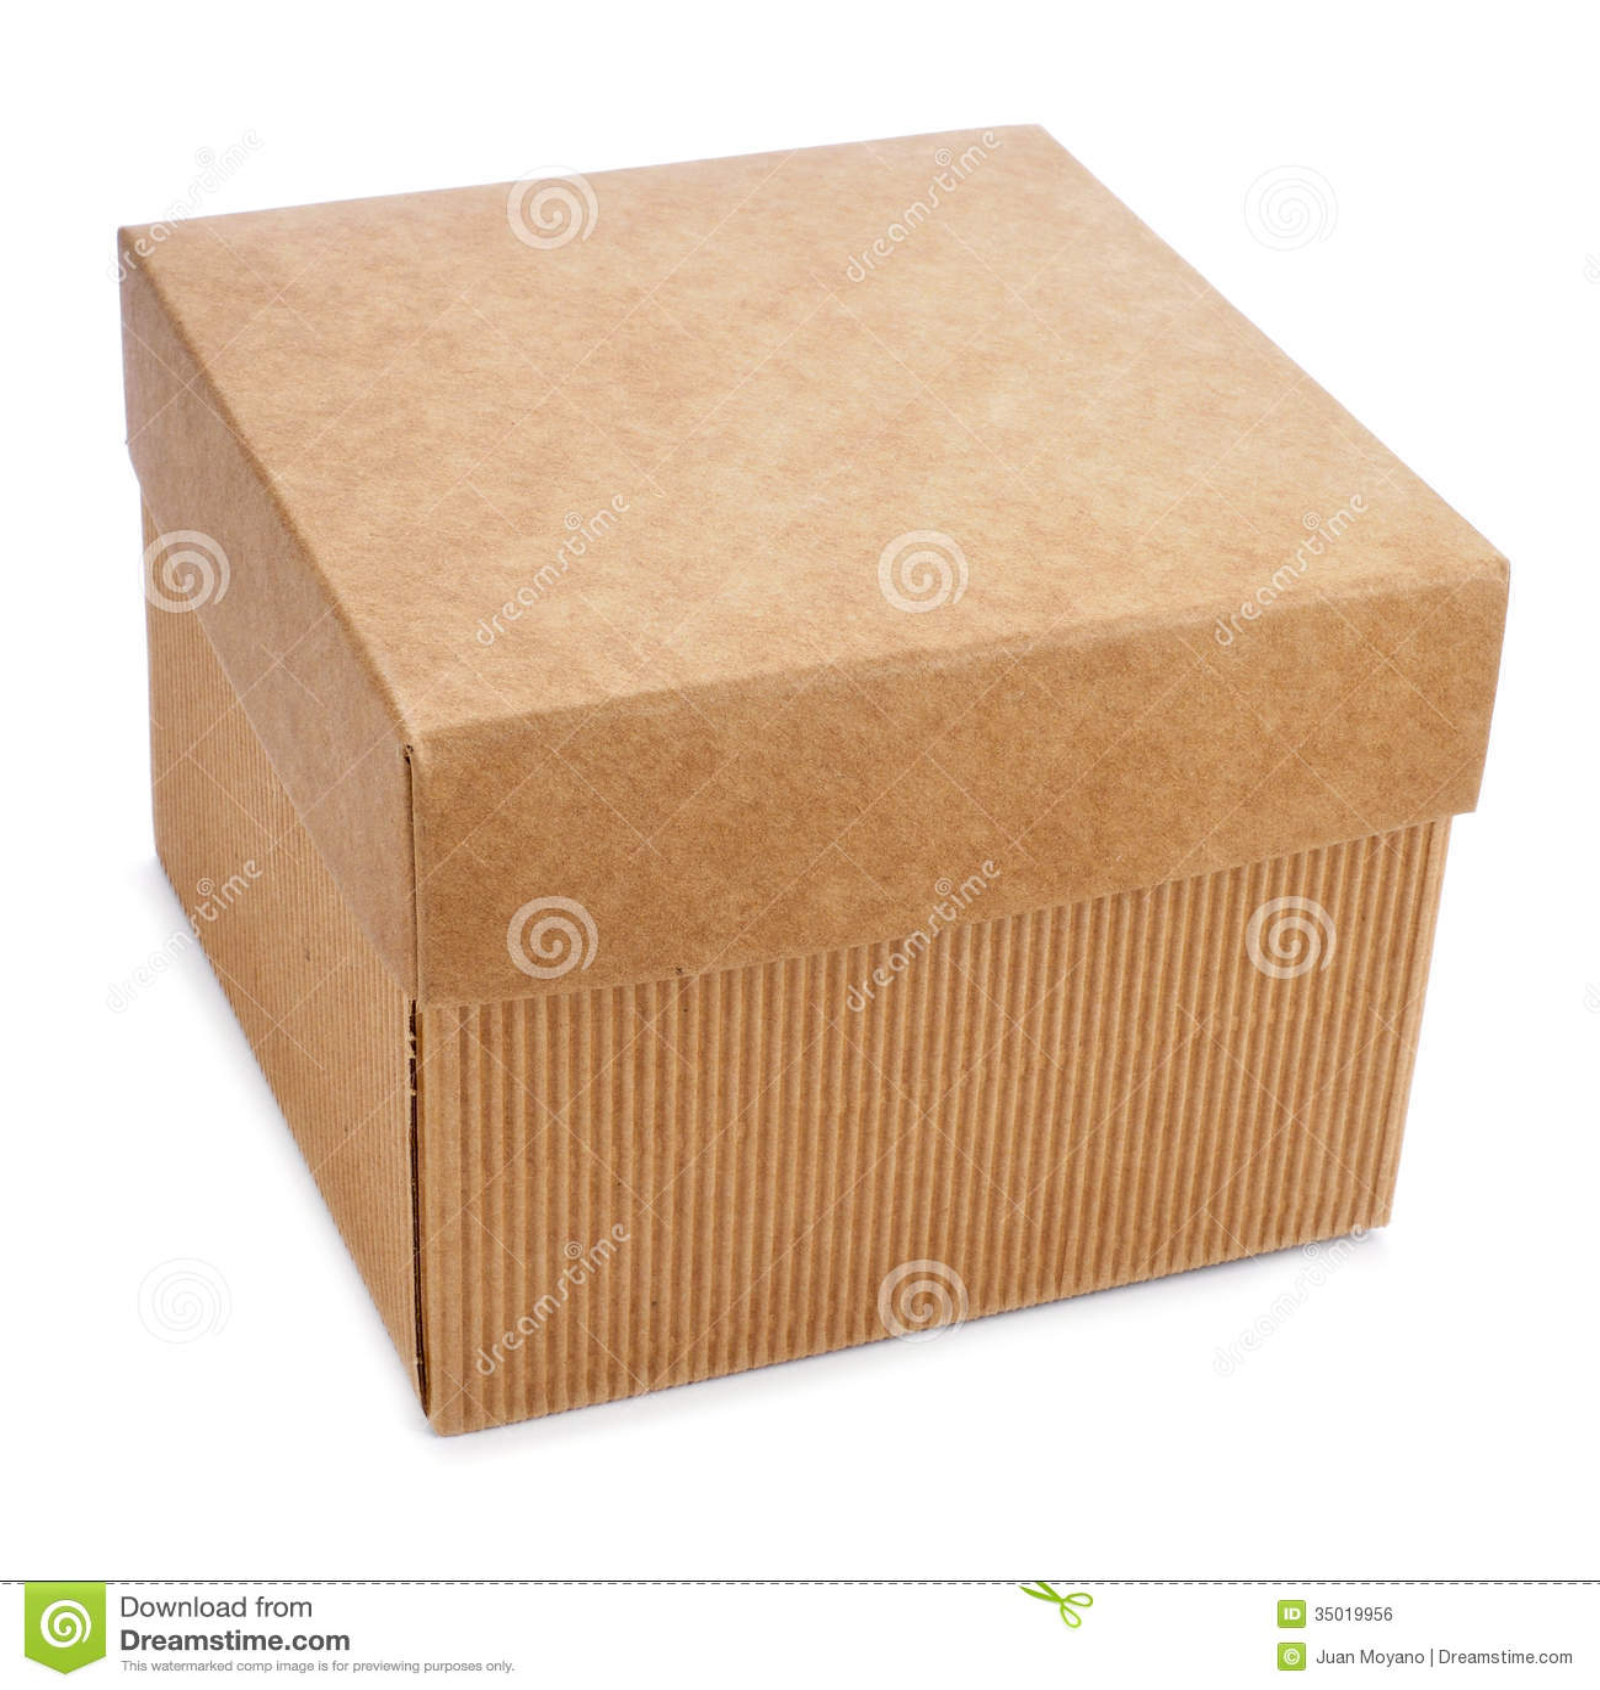 cardboard box stock photo image of post pack package 35019956. Black Bedroom Furniture Sets. Home Design Ideas